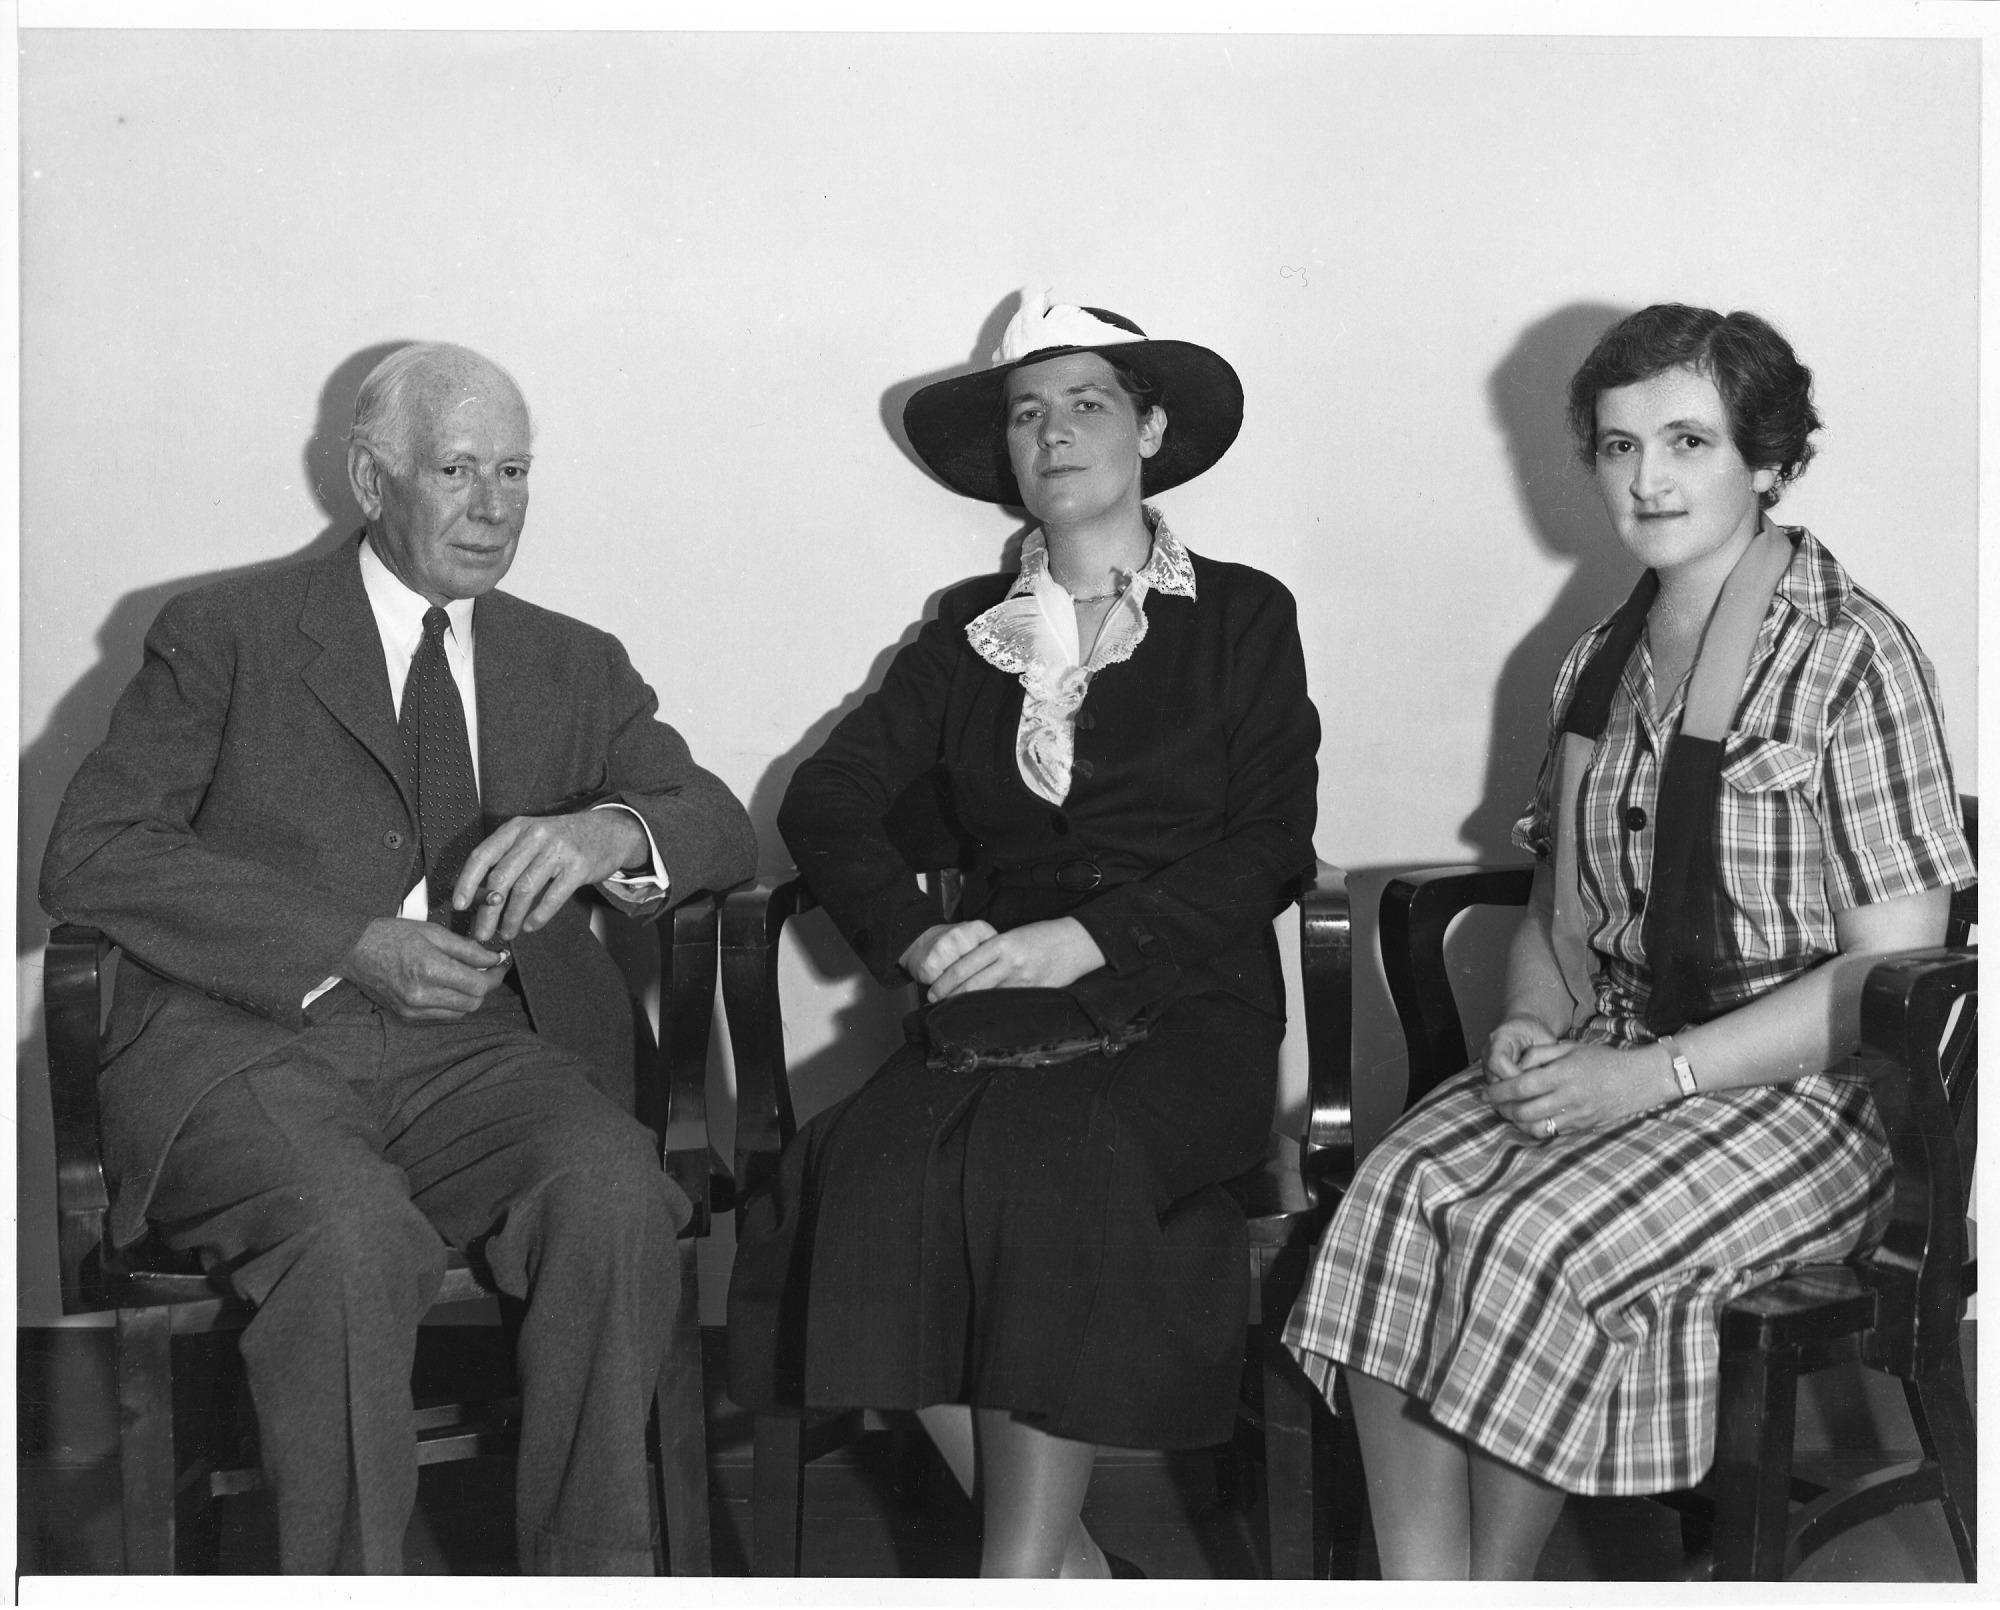 (l to r): Kendall Emerson (1907-1993), Alix Churchill, Eleanor Brown Merrill (b. 1887)